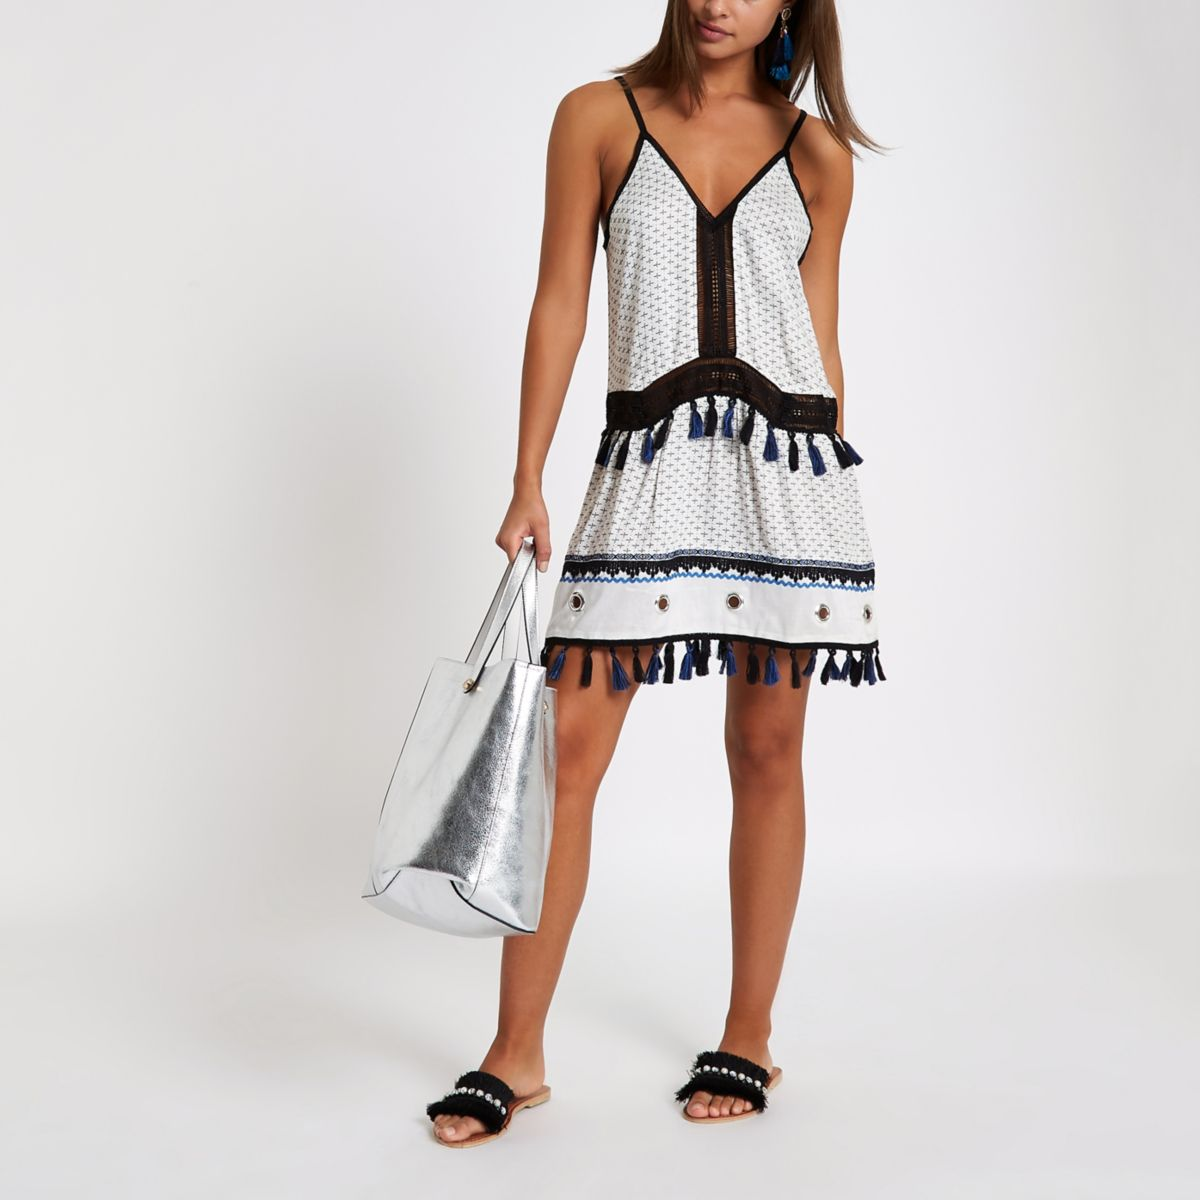 White eylelet dropped waist beach dress